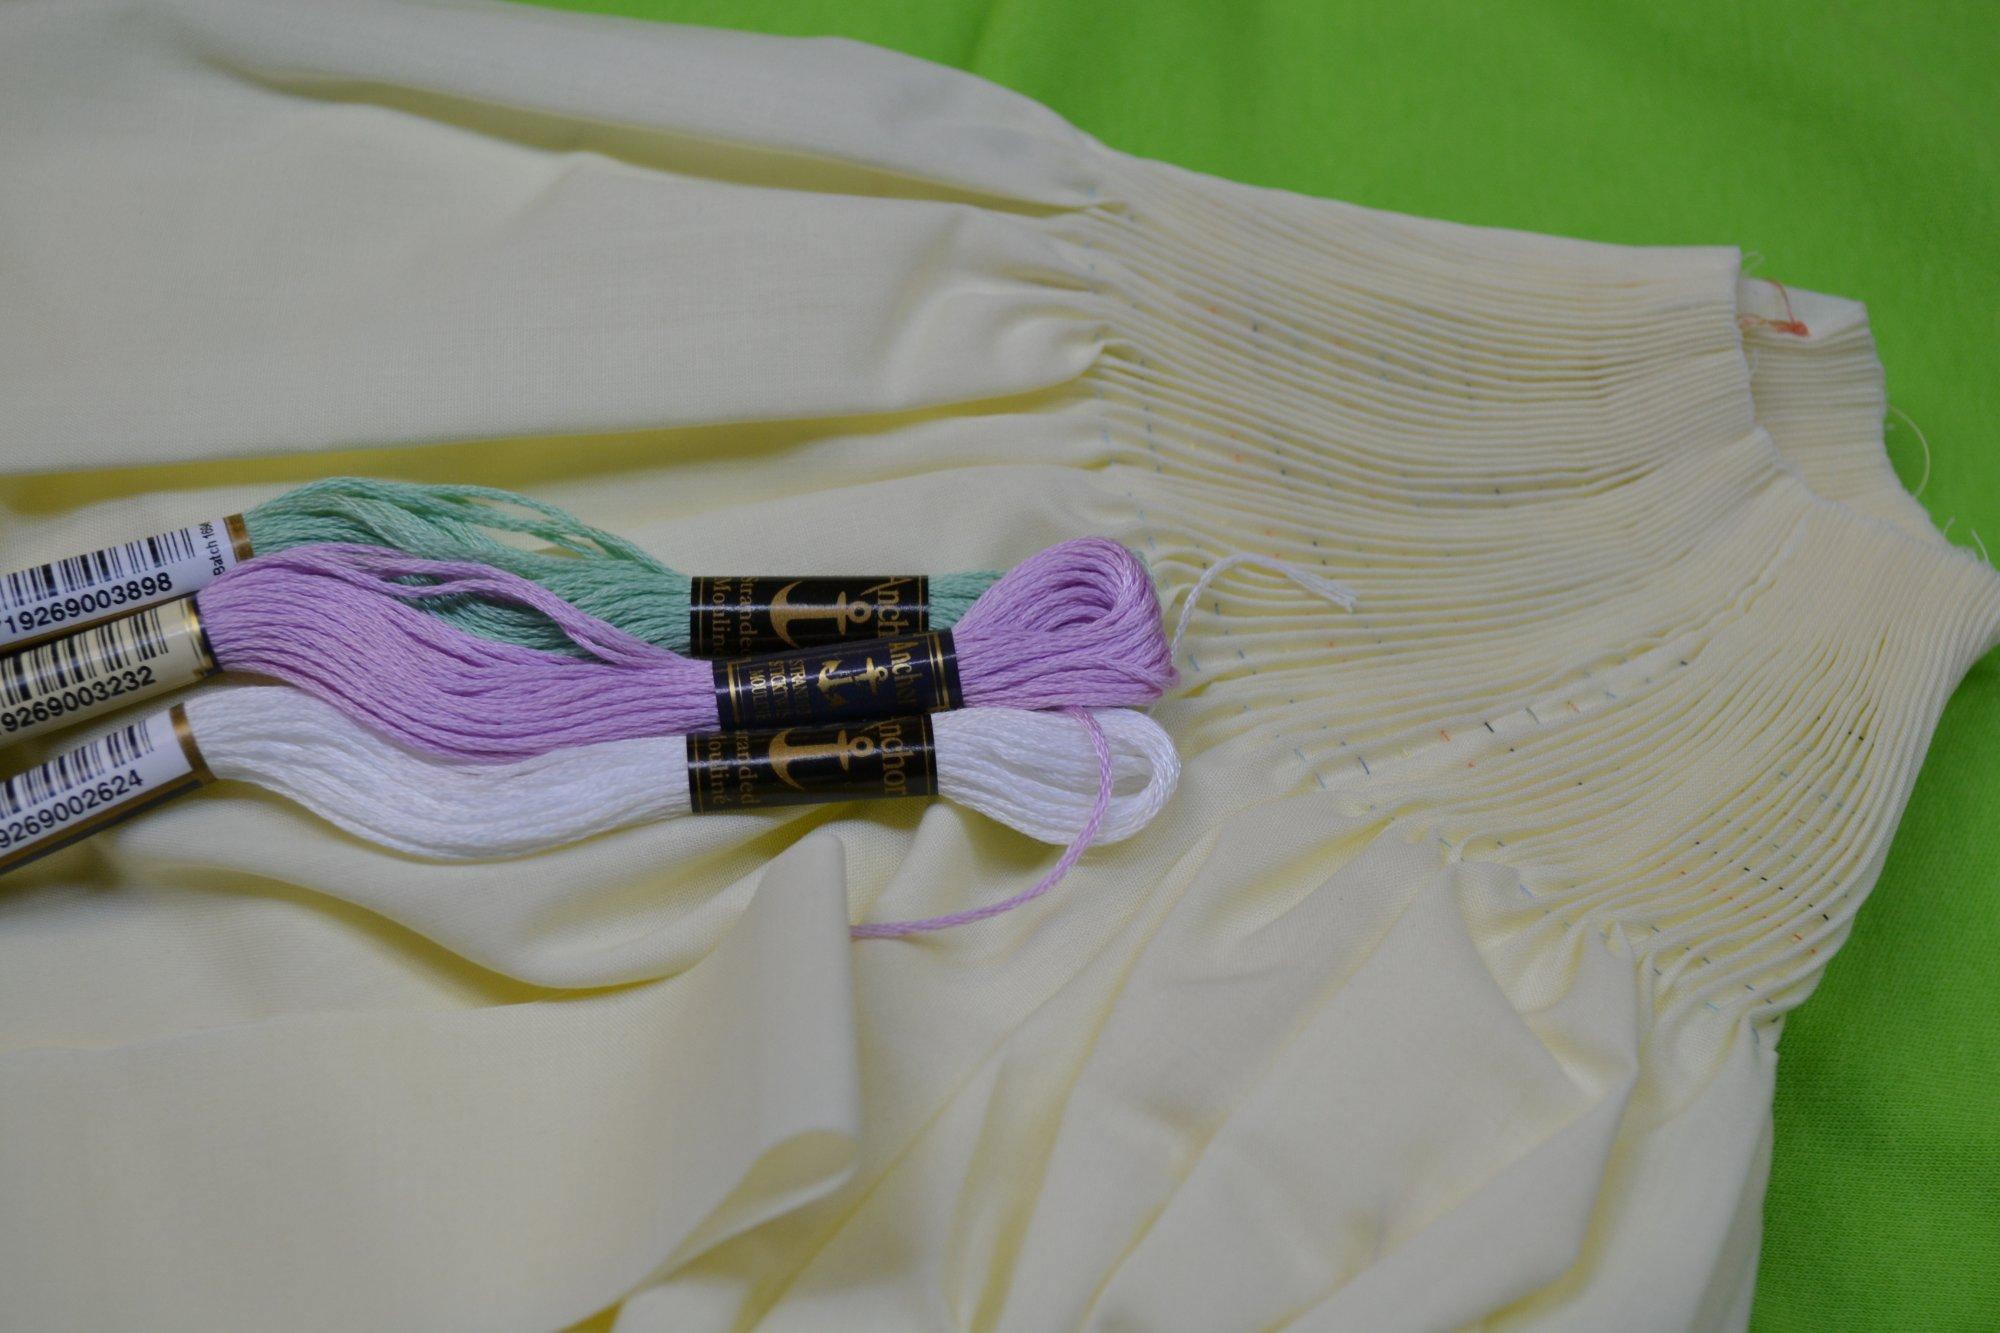 Bishop Kit - Pleated Sleeve Moonbeam 6 months